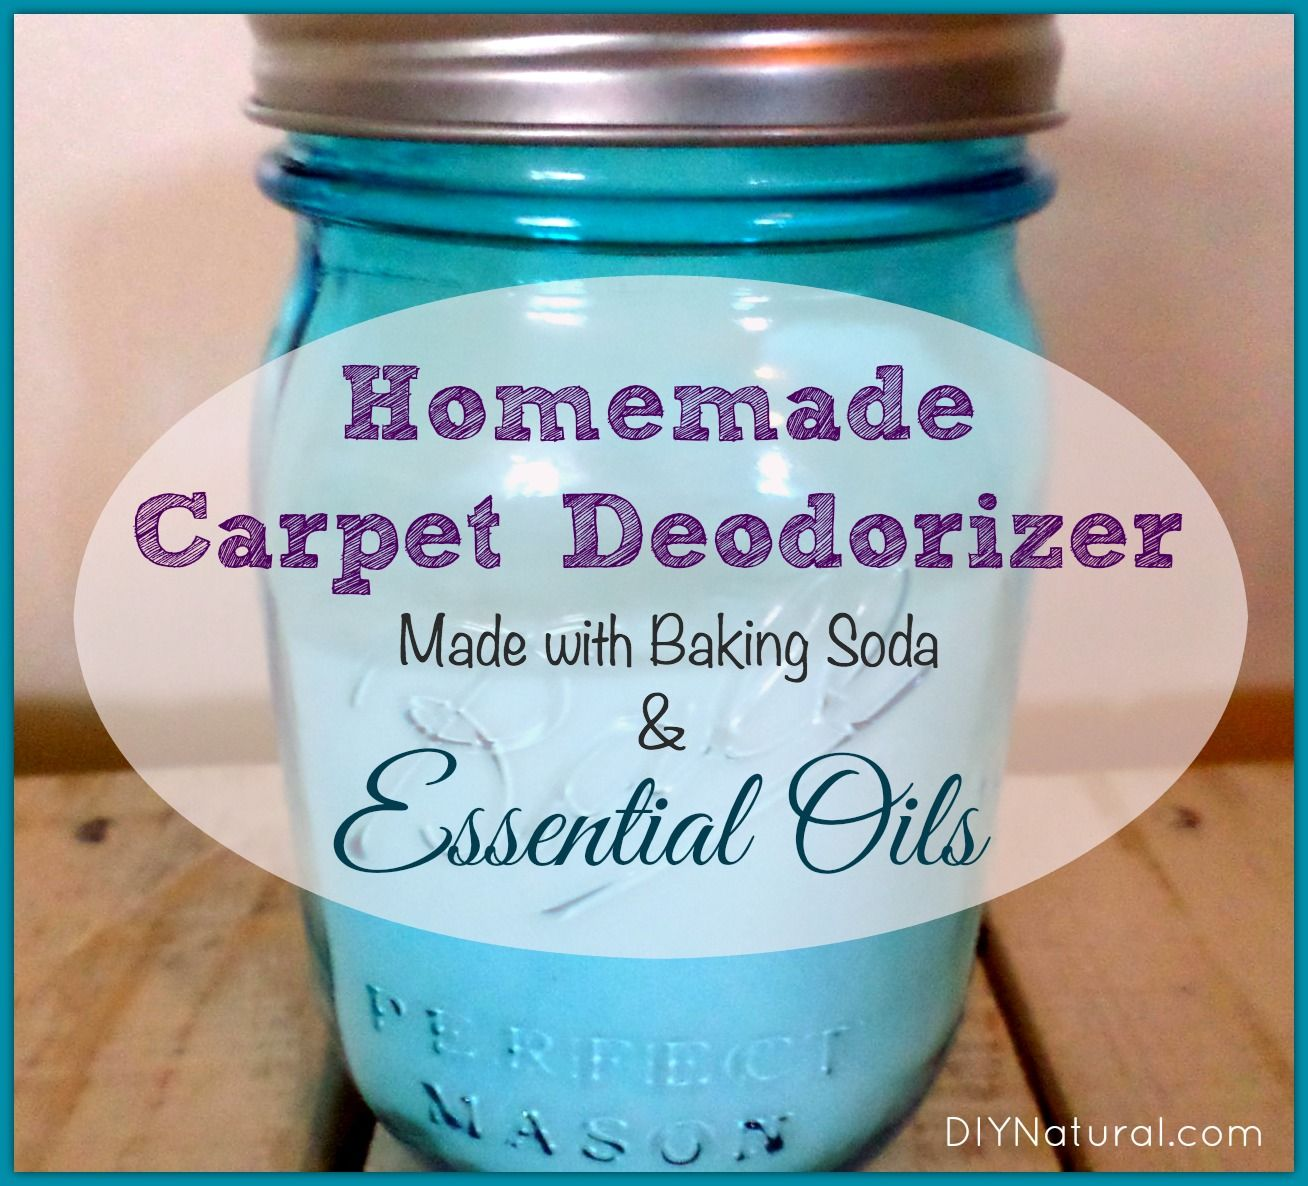 Captivating Baking Soda Carpet Cleaner / Deodorizer With Essential Oils